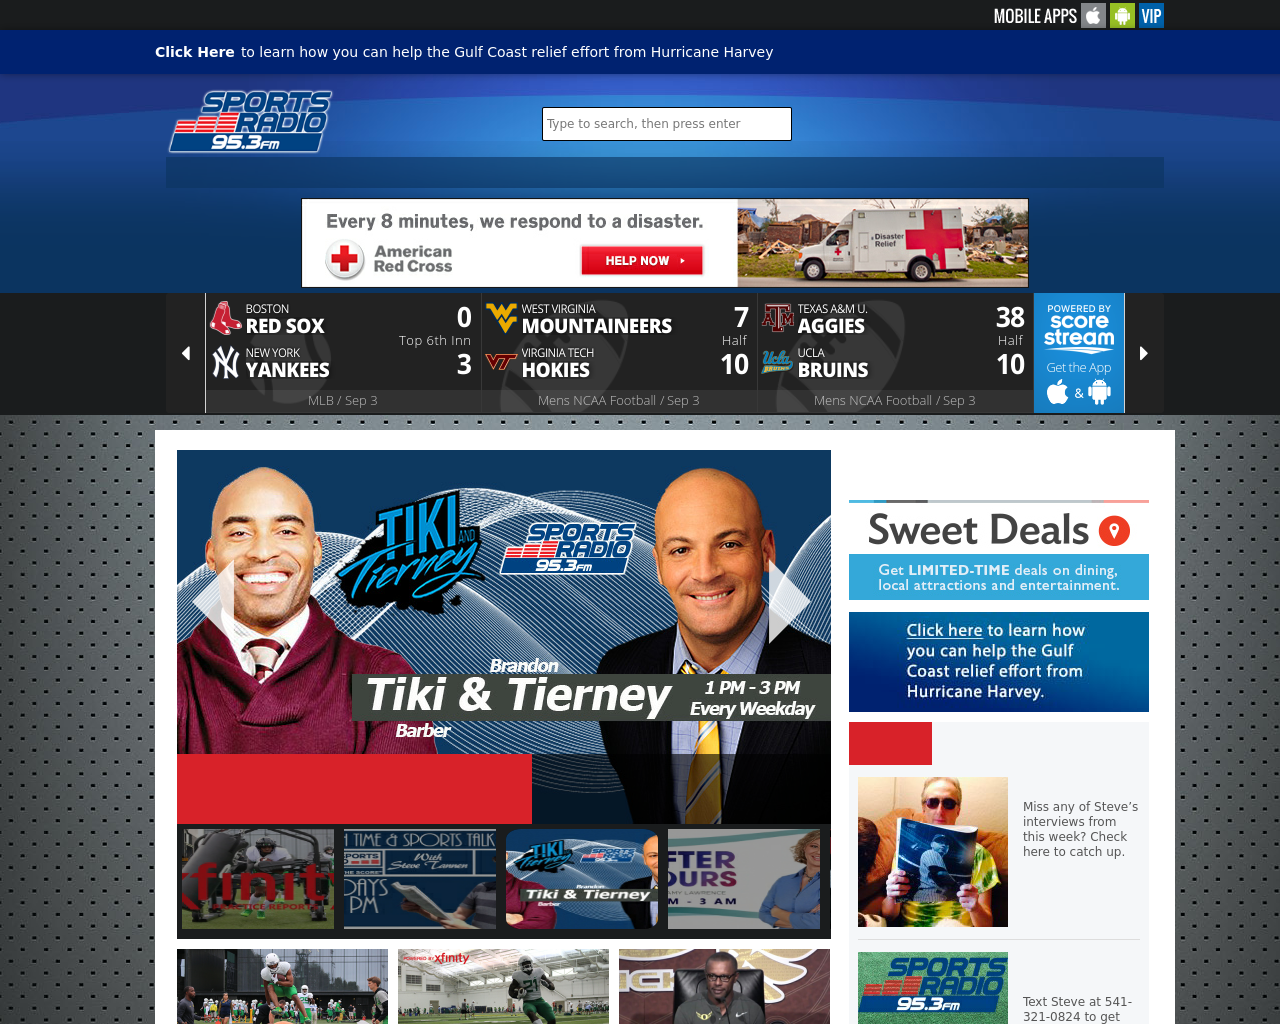 SPORTS-RADIO-95.3-Fm-Advertising-Reviews-Pricing